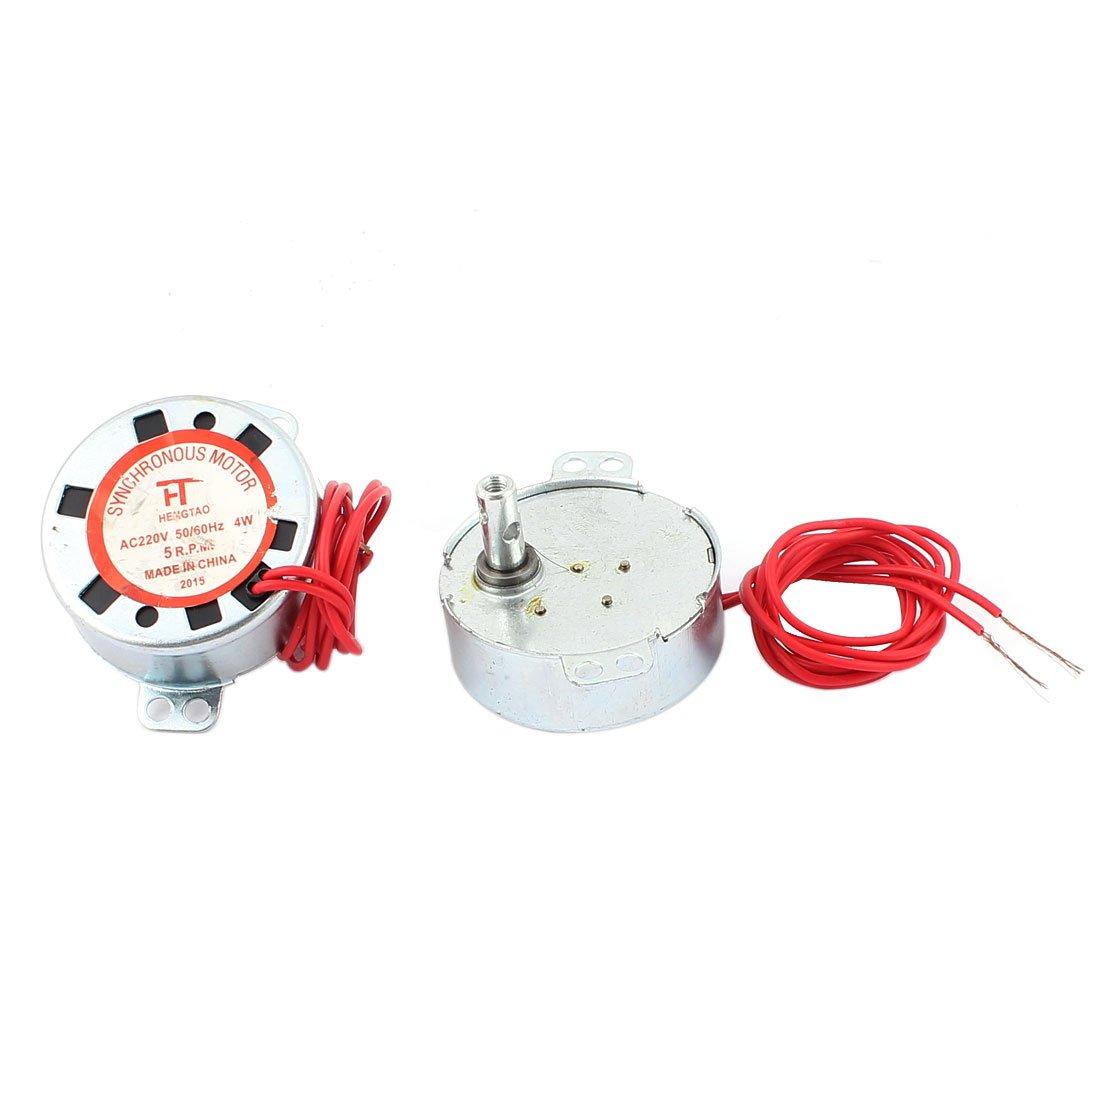 sourcingmap 2 pzas. AC 220V 4W 50/60Hz 5RPM 2 Cables Horno De ...